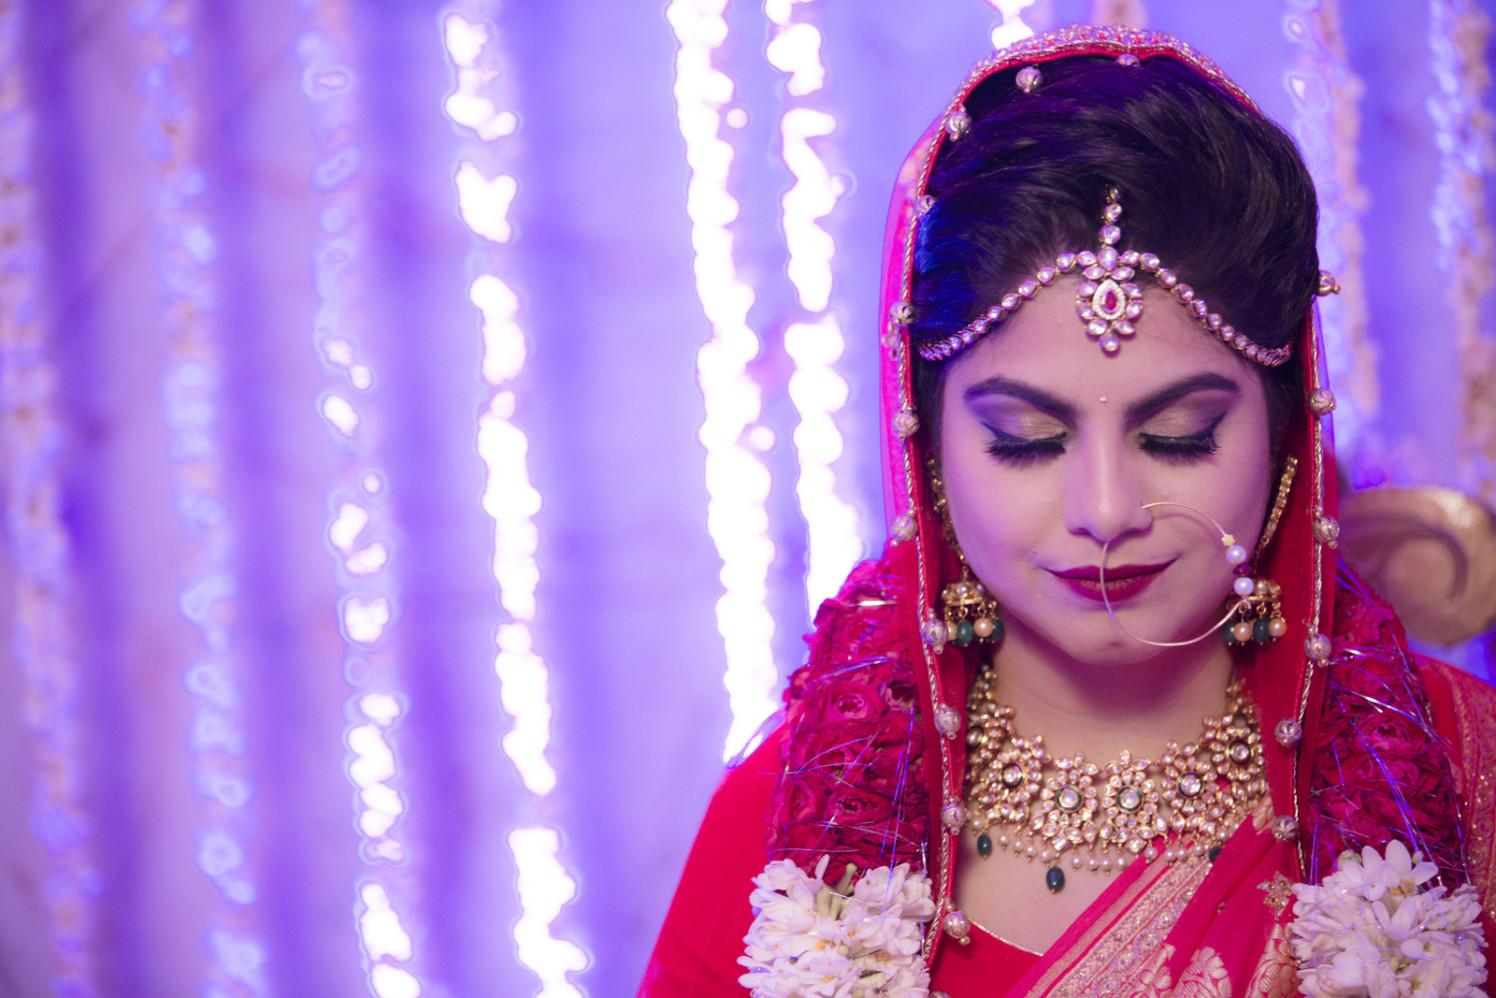 Ravishing Bride Wearing One Lace Tier Kundan Mang tikka by Arpit Gulati Wedding-photography Bridal-makeup Bridal-jewellery-and-accessories   Weddings Photos & Ideas